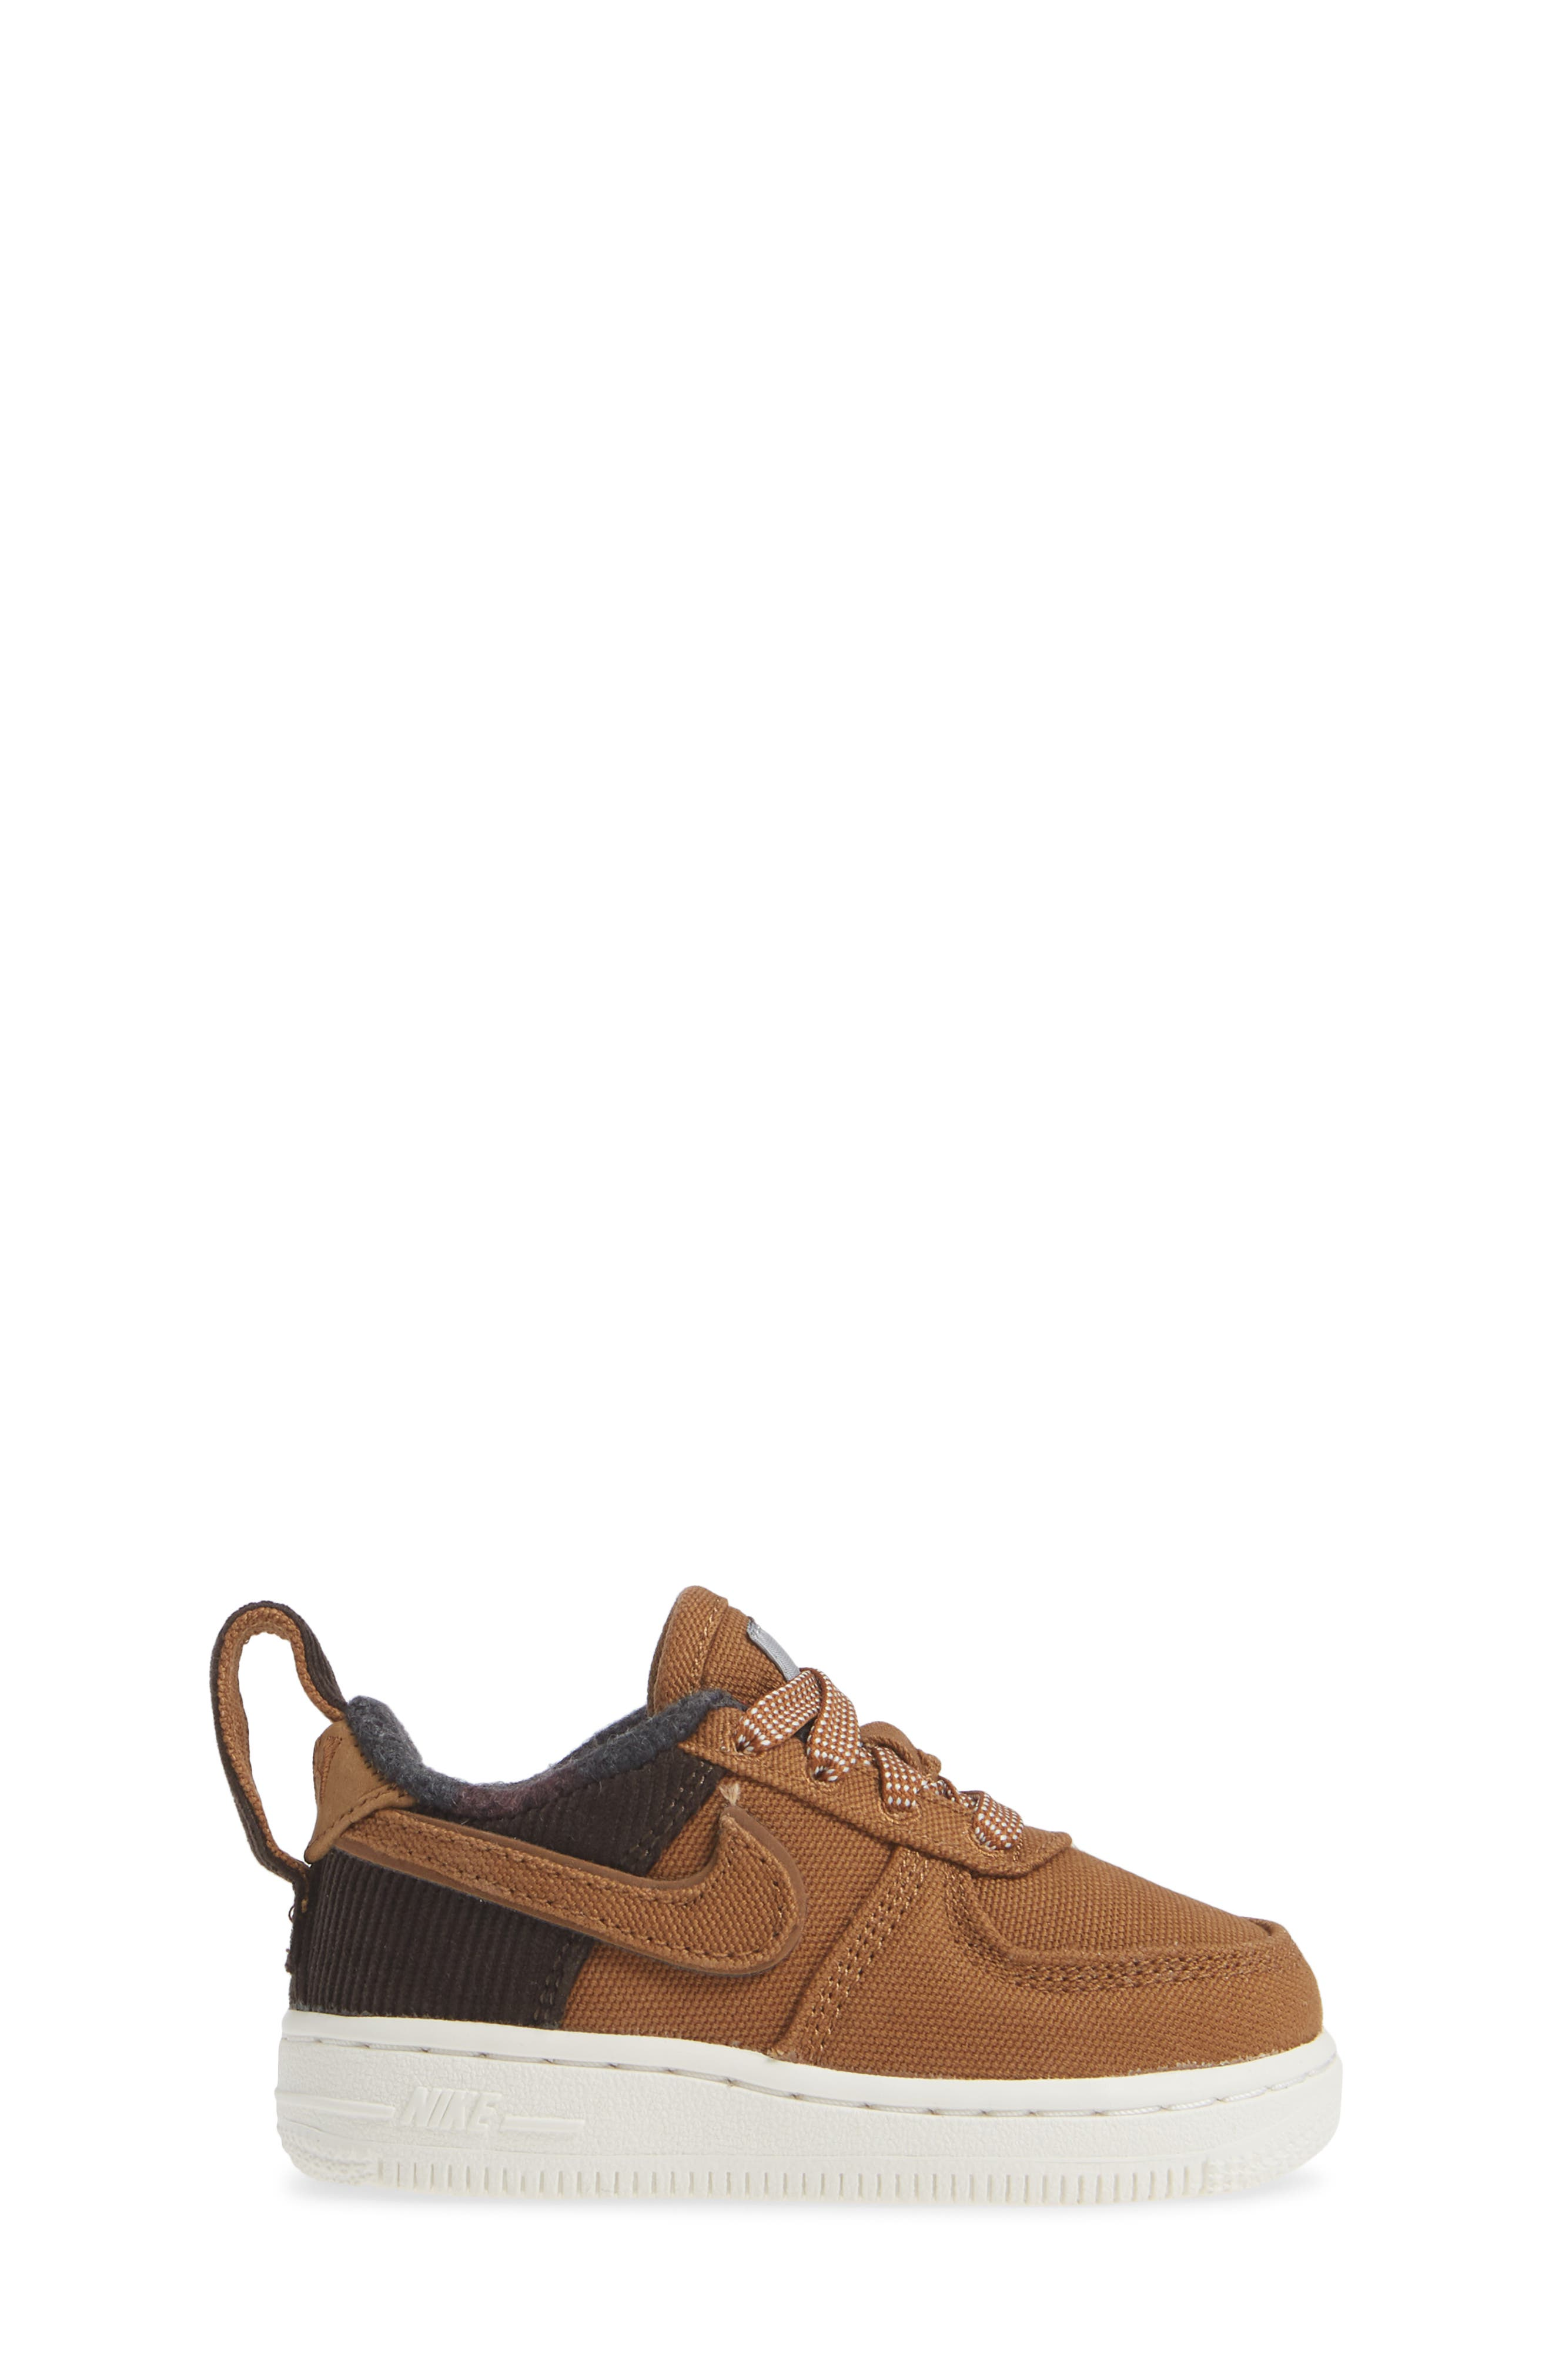 x Carhartt Air Force 1 Premium Sneaker,                             Alternate thumbnail 3, color,                             ALE BROWN/ ALE BROWN-SAIL